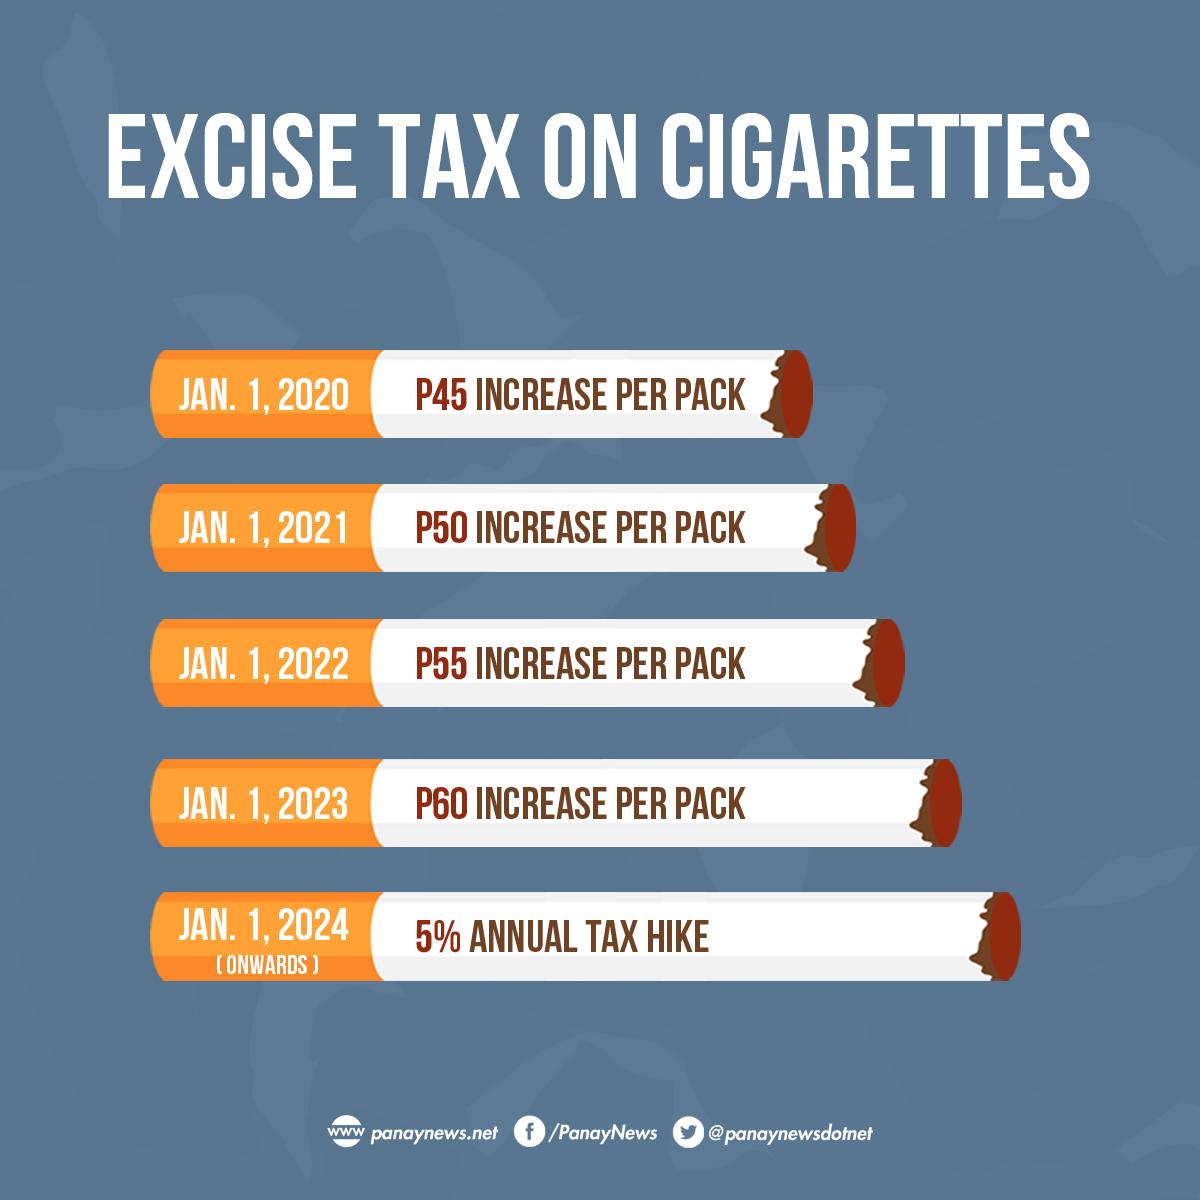 Senate Approves Bill On Higher Cigarette Taxes